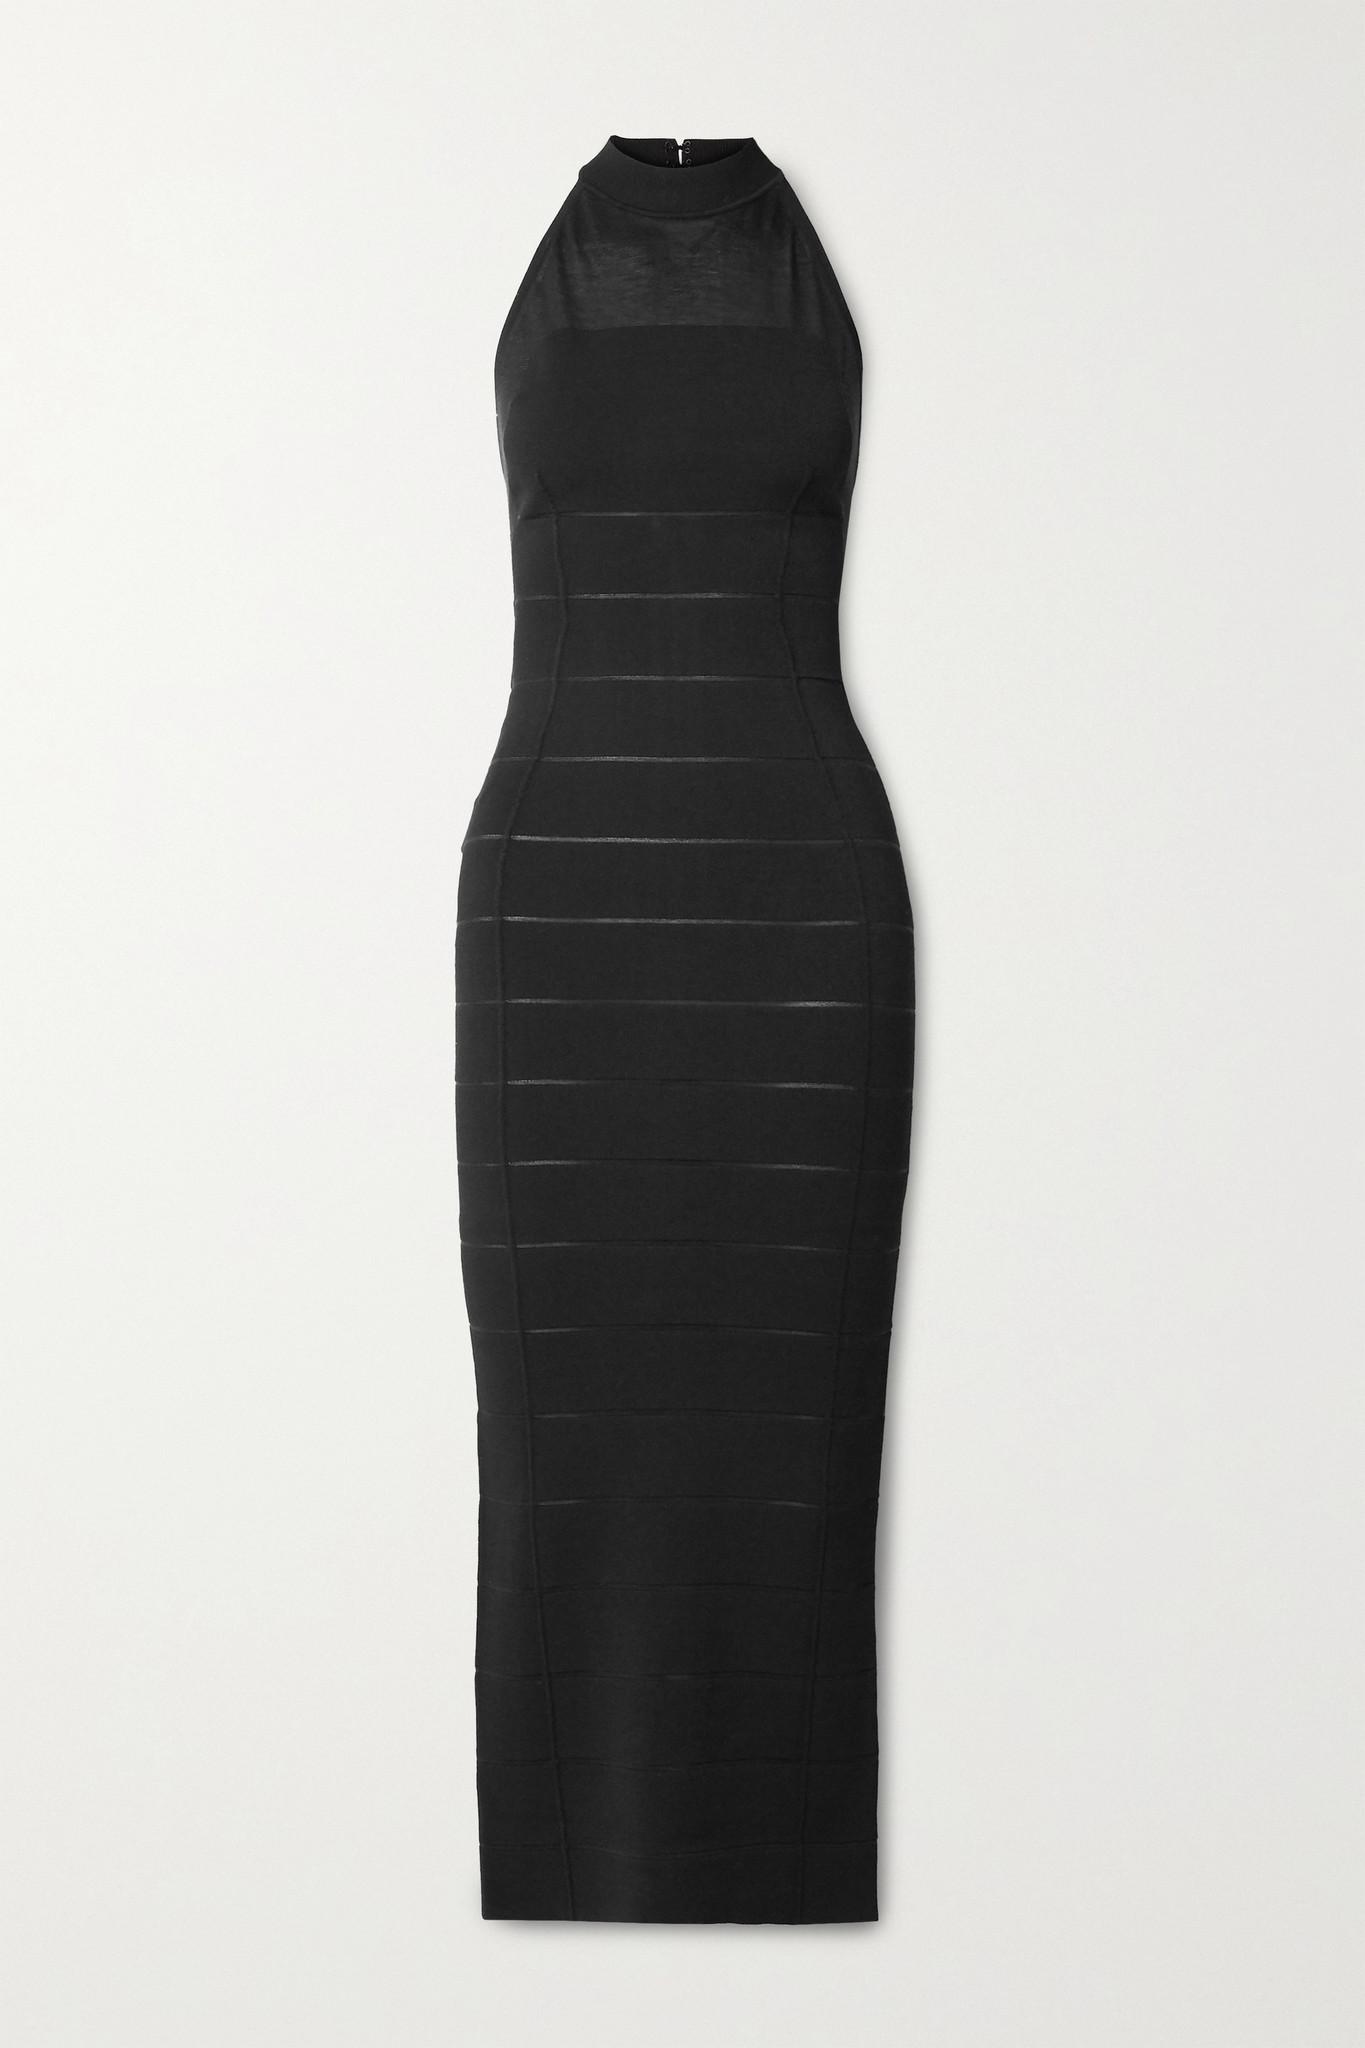 HERVÉ LÉGER - 绷带挂脖礼服 - 黑色 - medium